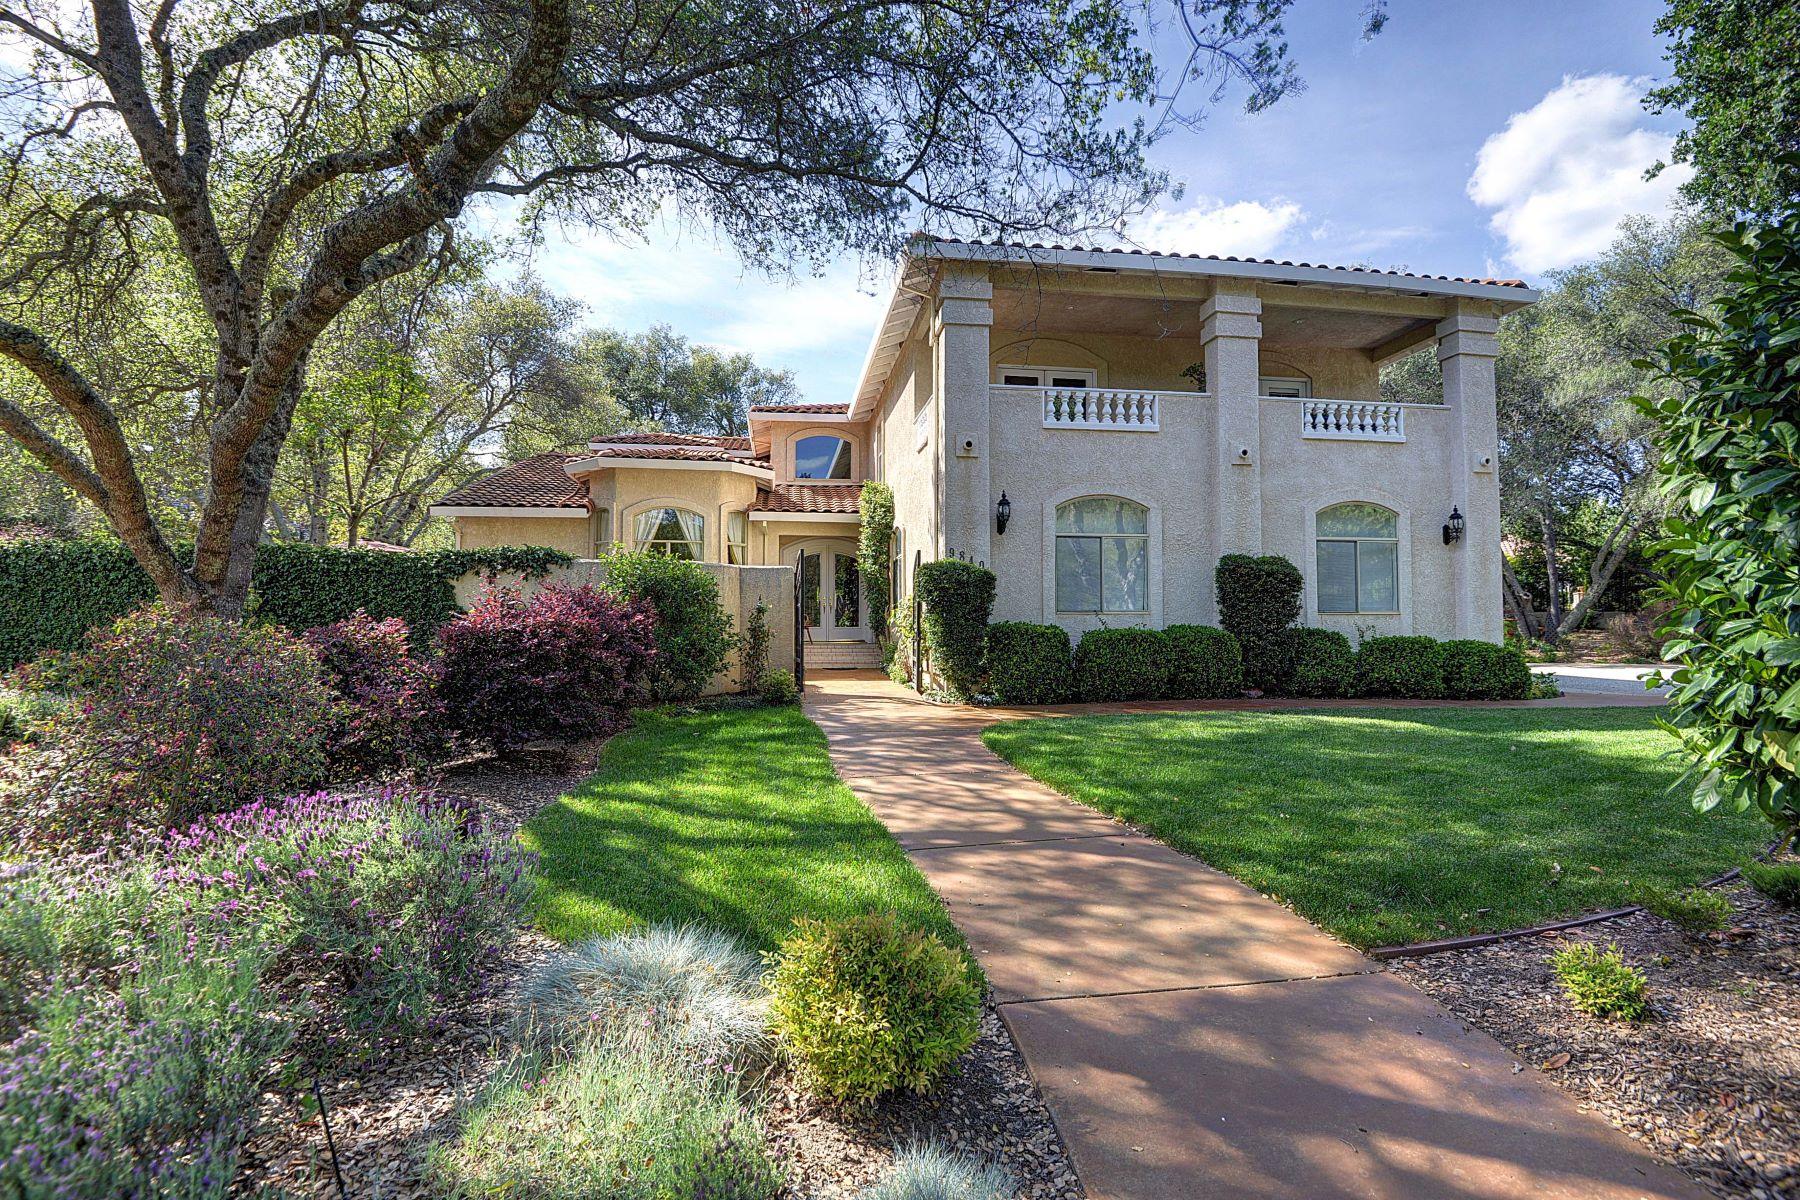 独户住宅 为 销售 在 9840 Los Lagos Circle, Granite Bay, CA 95746 Granite Bay, 加利福尼亚州 95746 美国